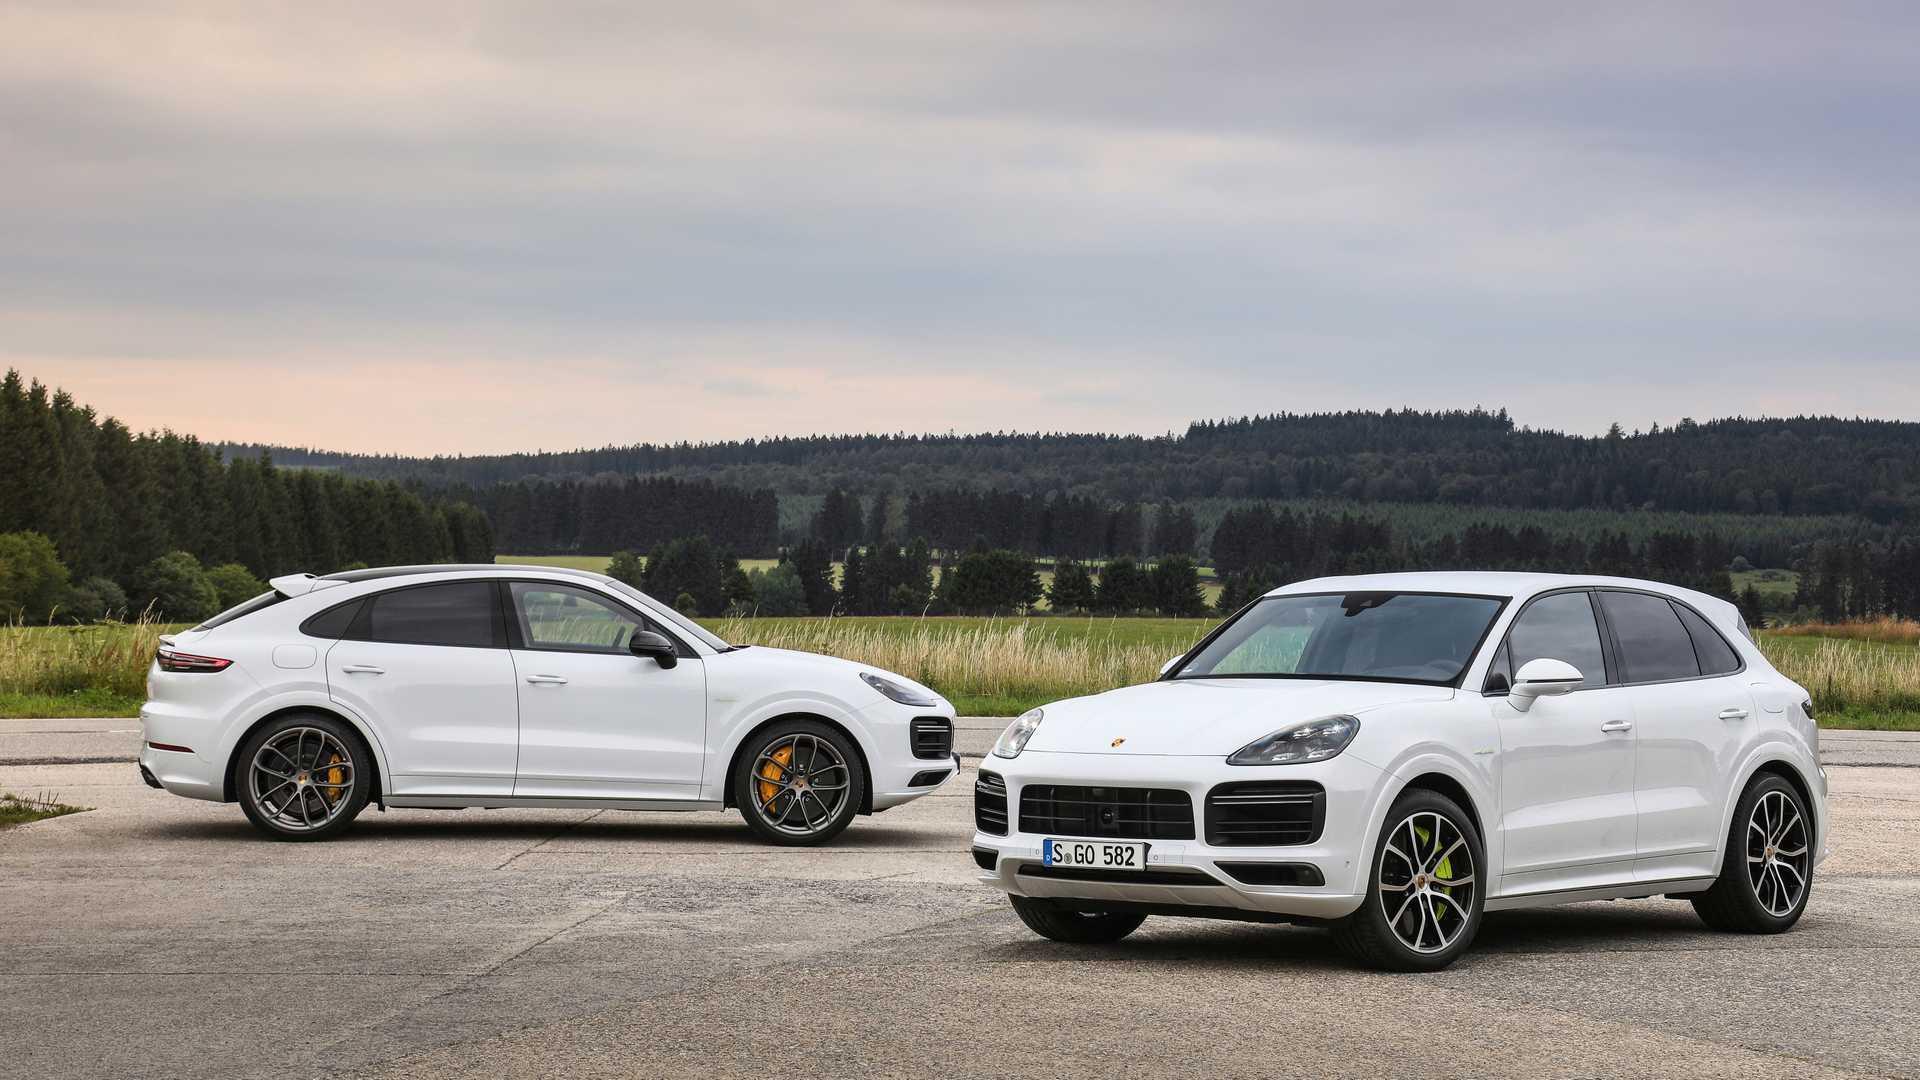 2020 Porsche Cayenne Turbo S E-Hybrid, Coupe Turbo S E-Hybrid, and Coupe E-Hybrid